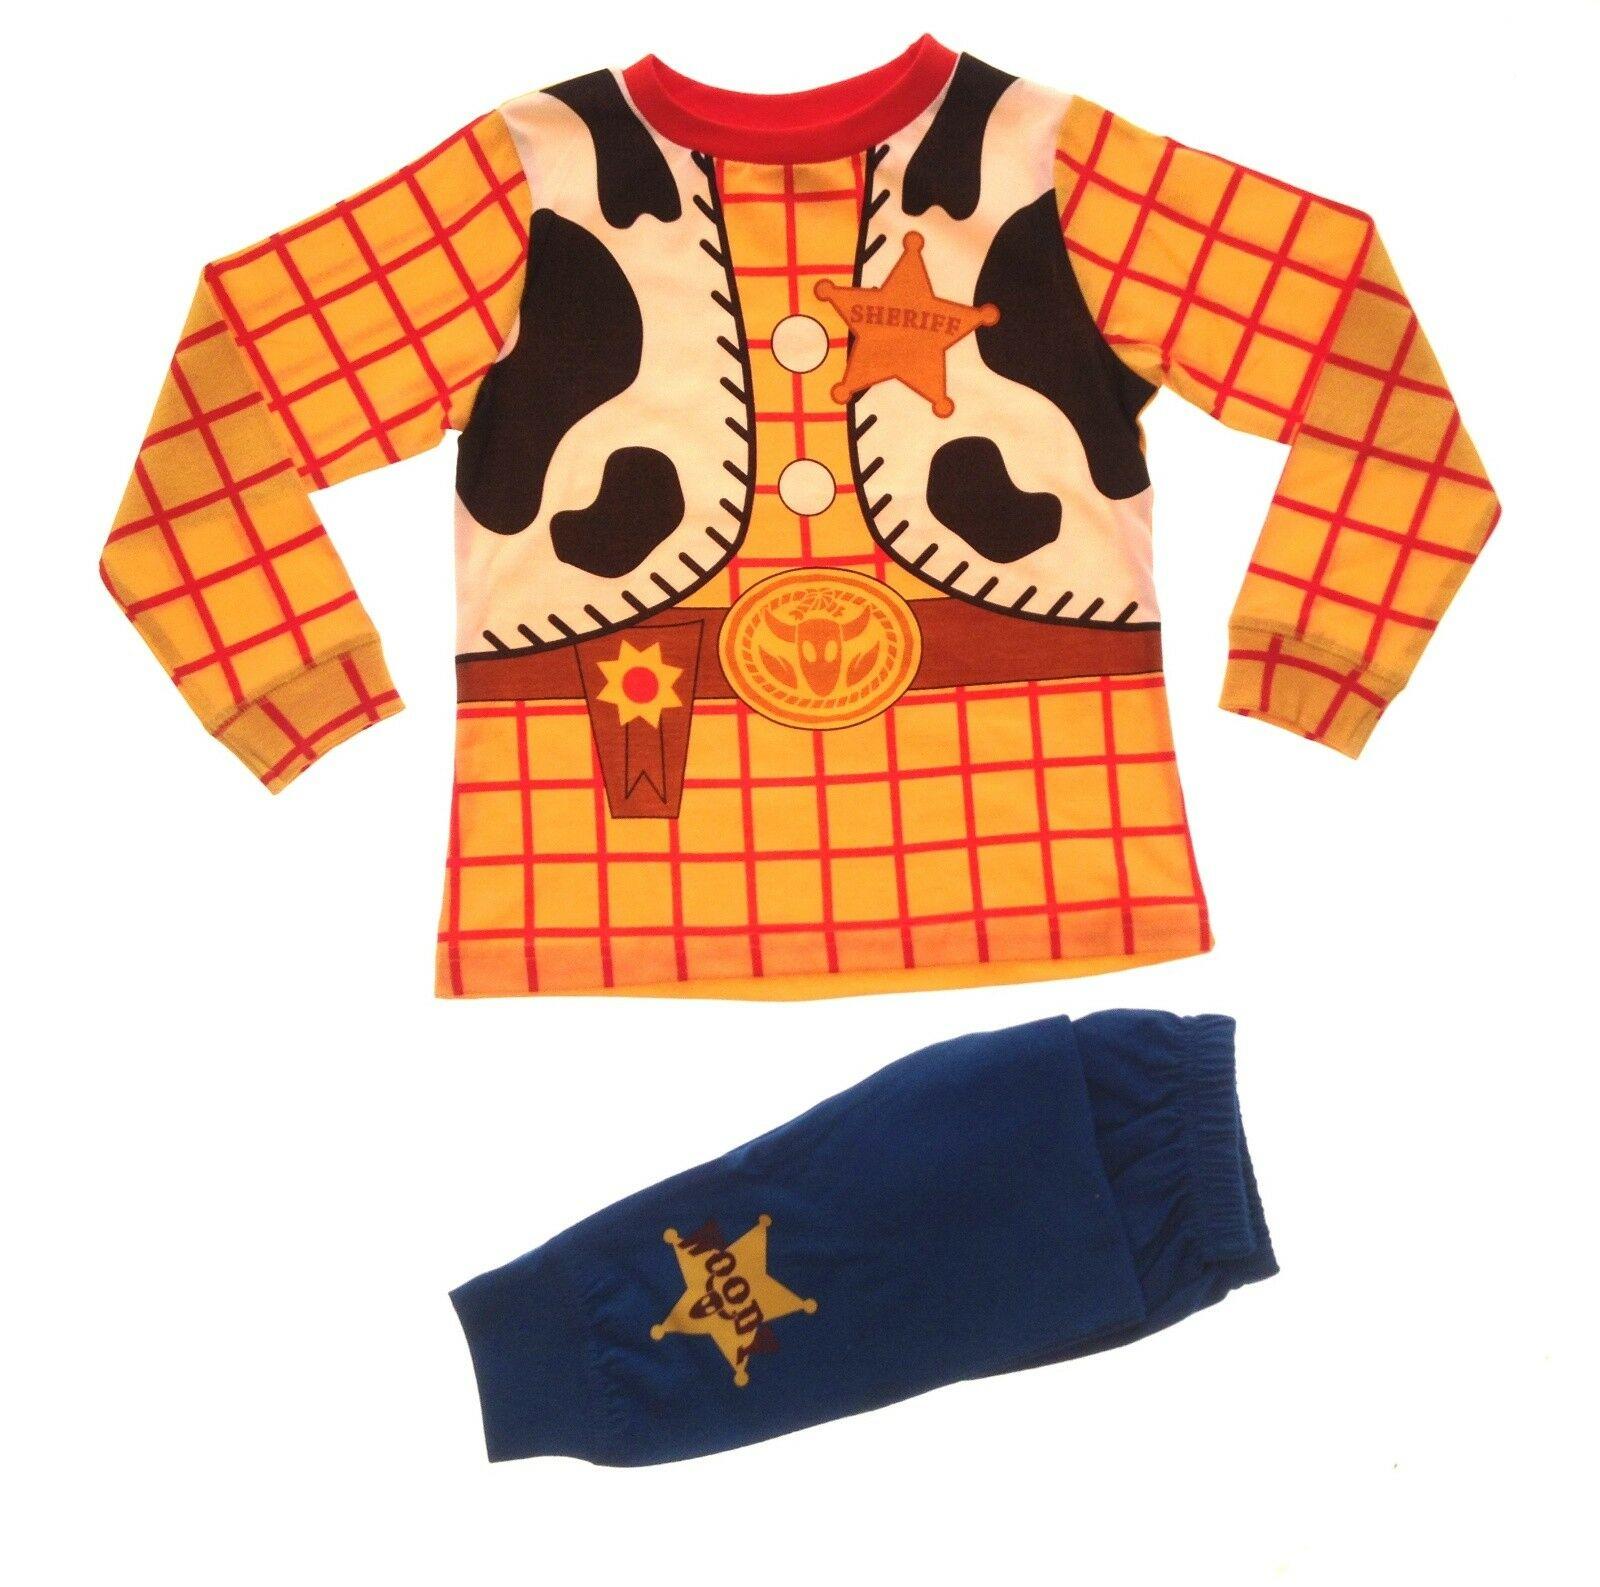 Boys Novelty Character Dress Up Pyjamas Kids Full Length Superhero Pjs Gift Size